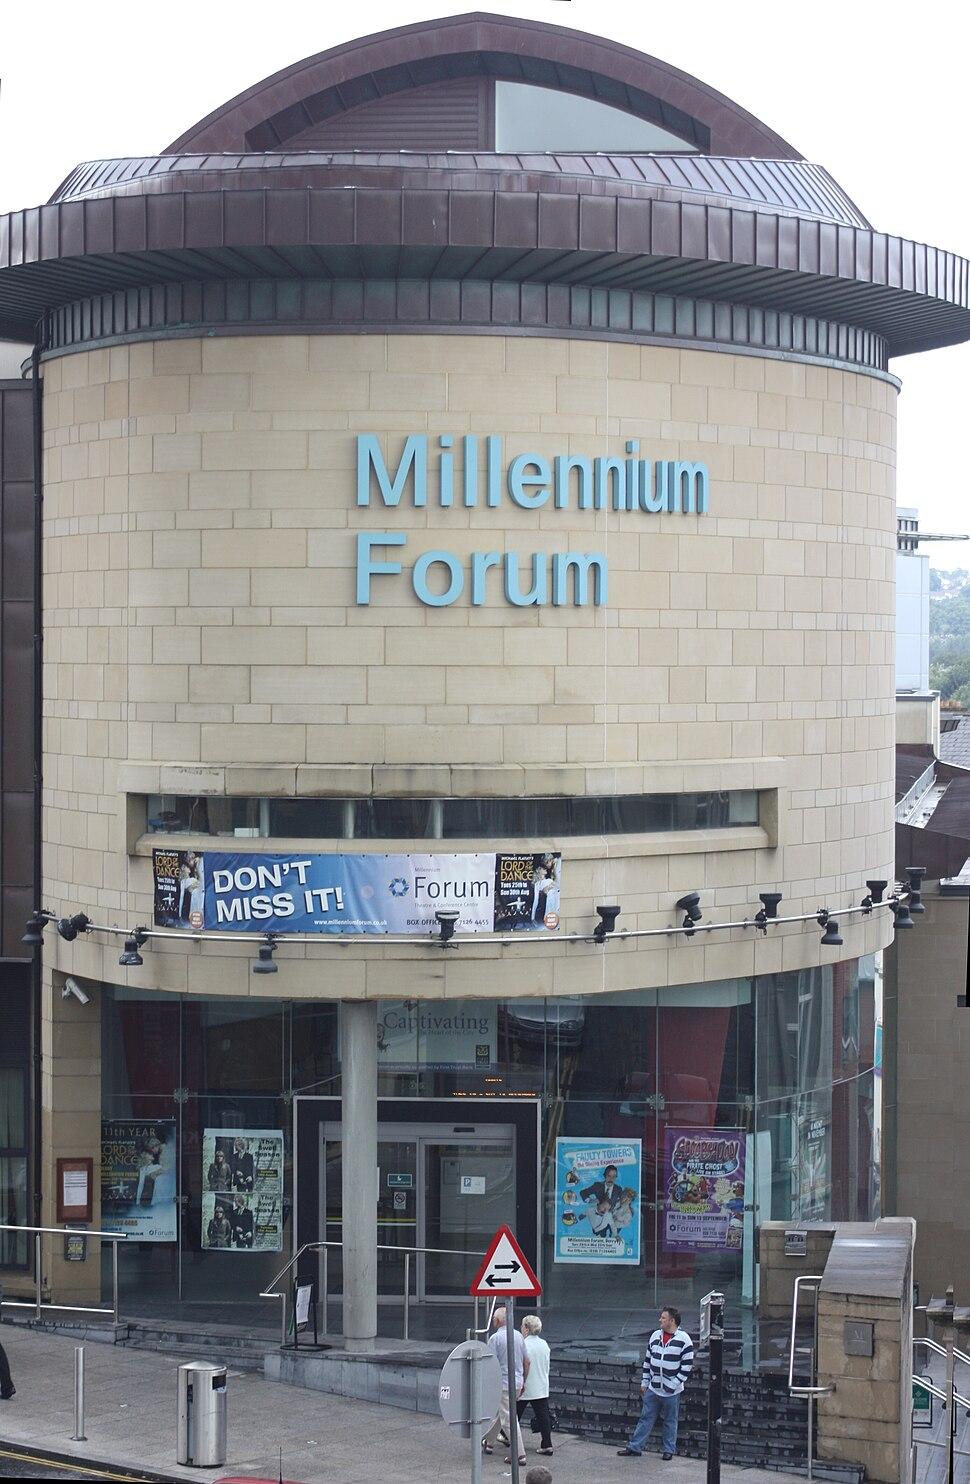 Millennium Forum (02), August 2009